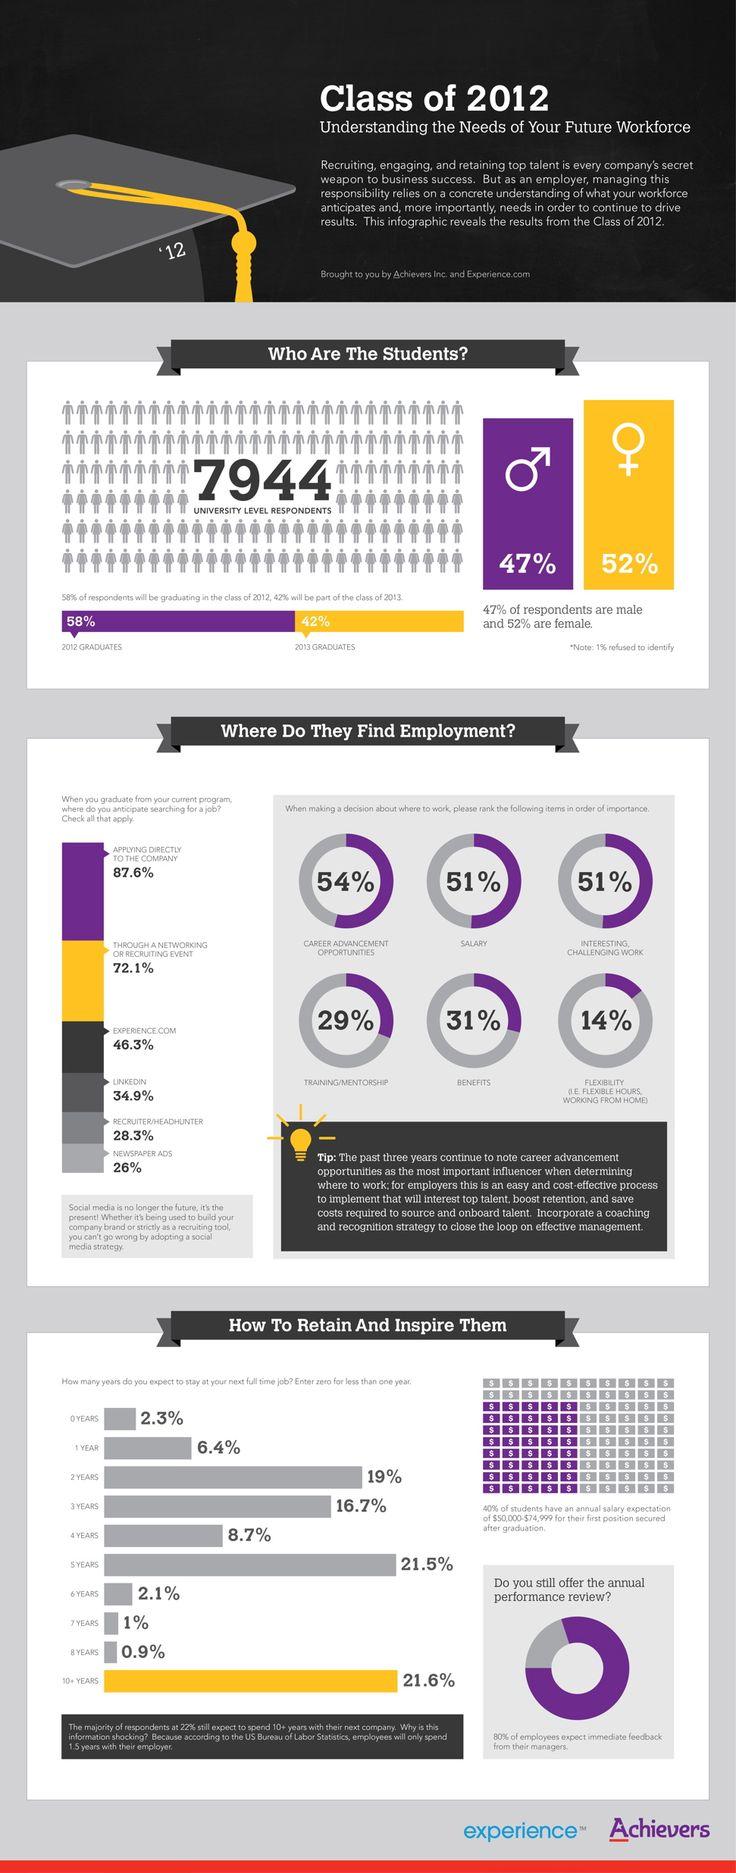 Adelantándose a las necesidades del mercado de trabajo 2012 #infografia #infographic